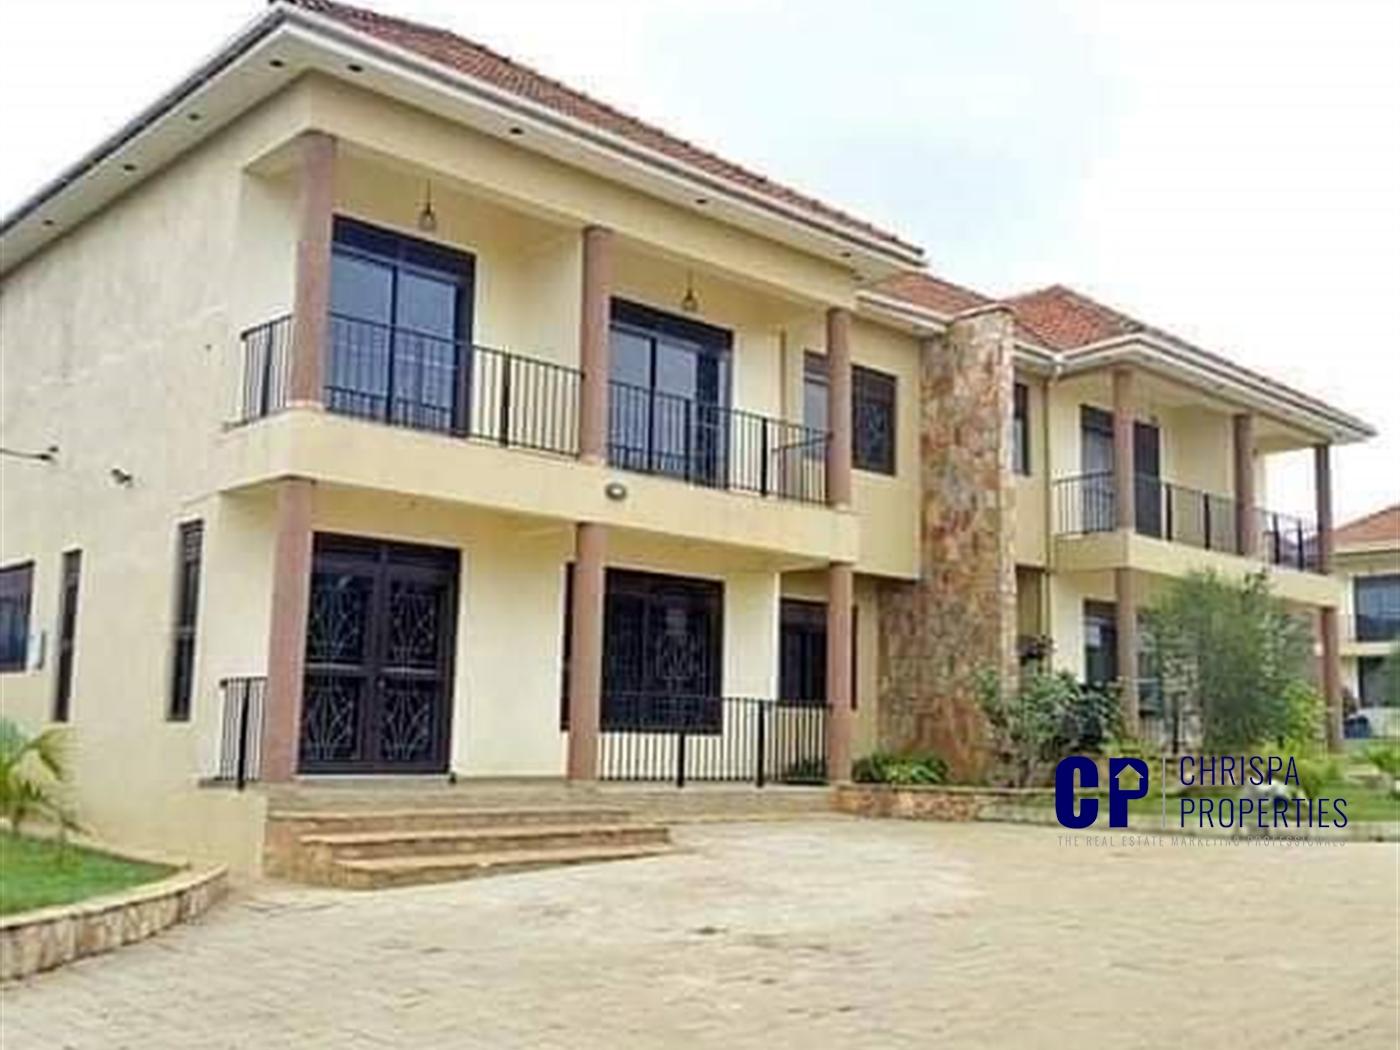 3 Bedroom Duplex For Rent In Ntinda Kampala Uganda Code 61008 30 05 2021